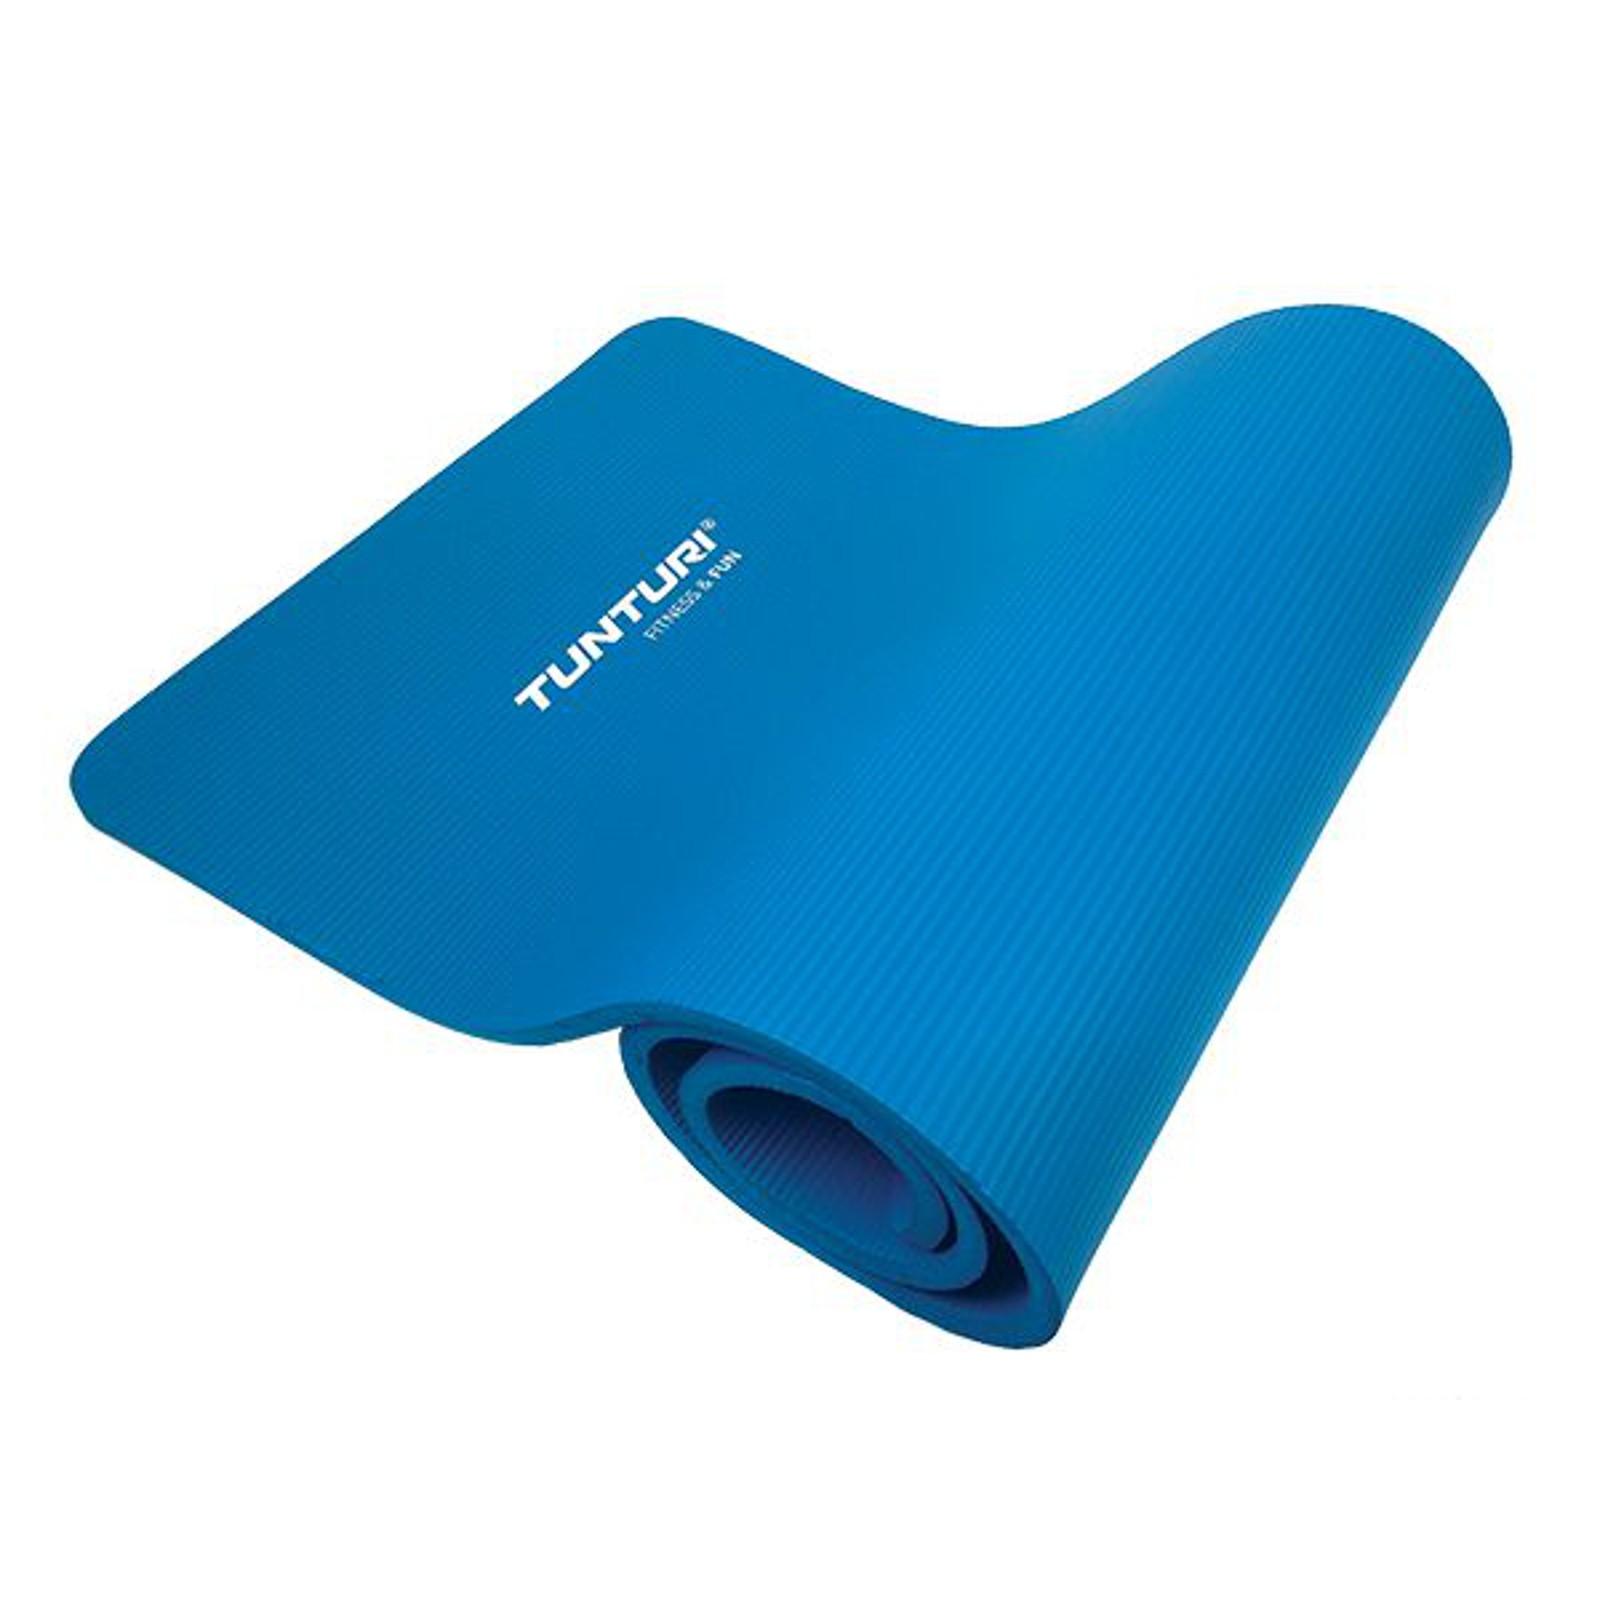 Tunturi Fitnessmatte Blau G 252 Nstig Kaufen Sport Tiedje